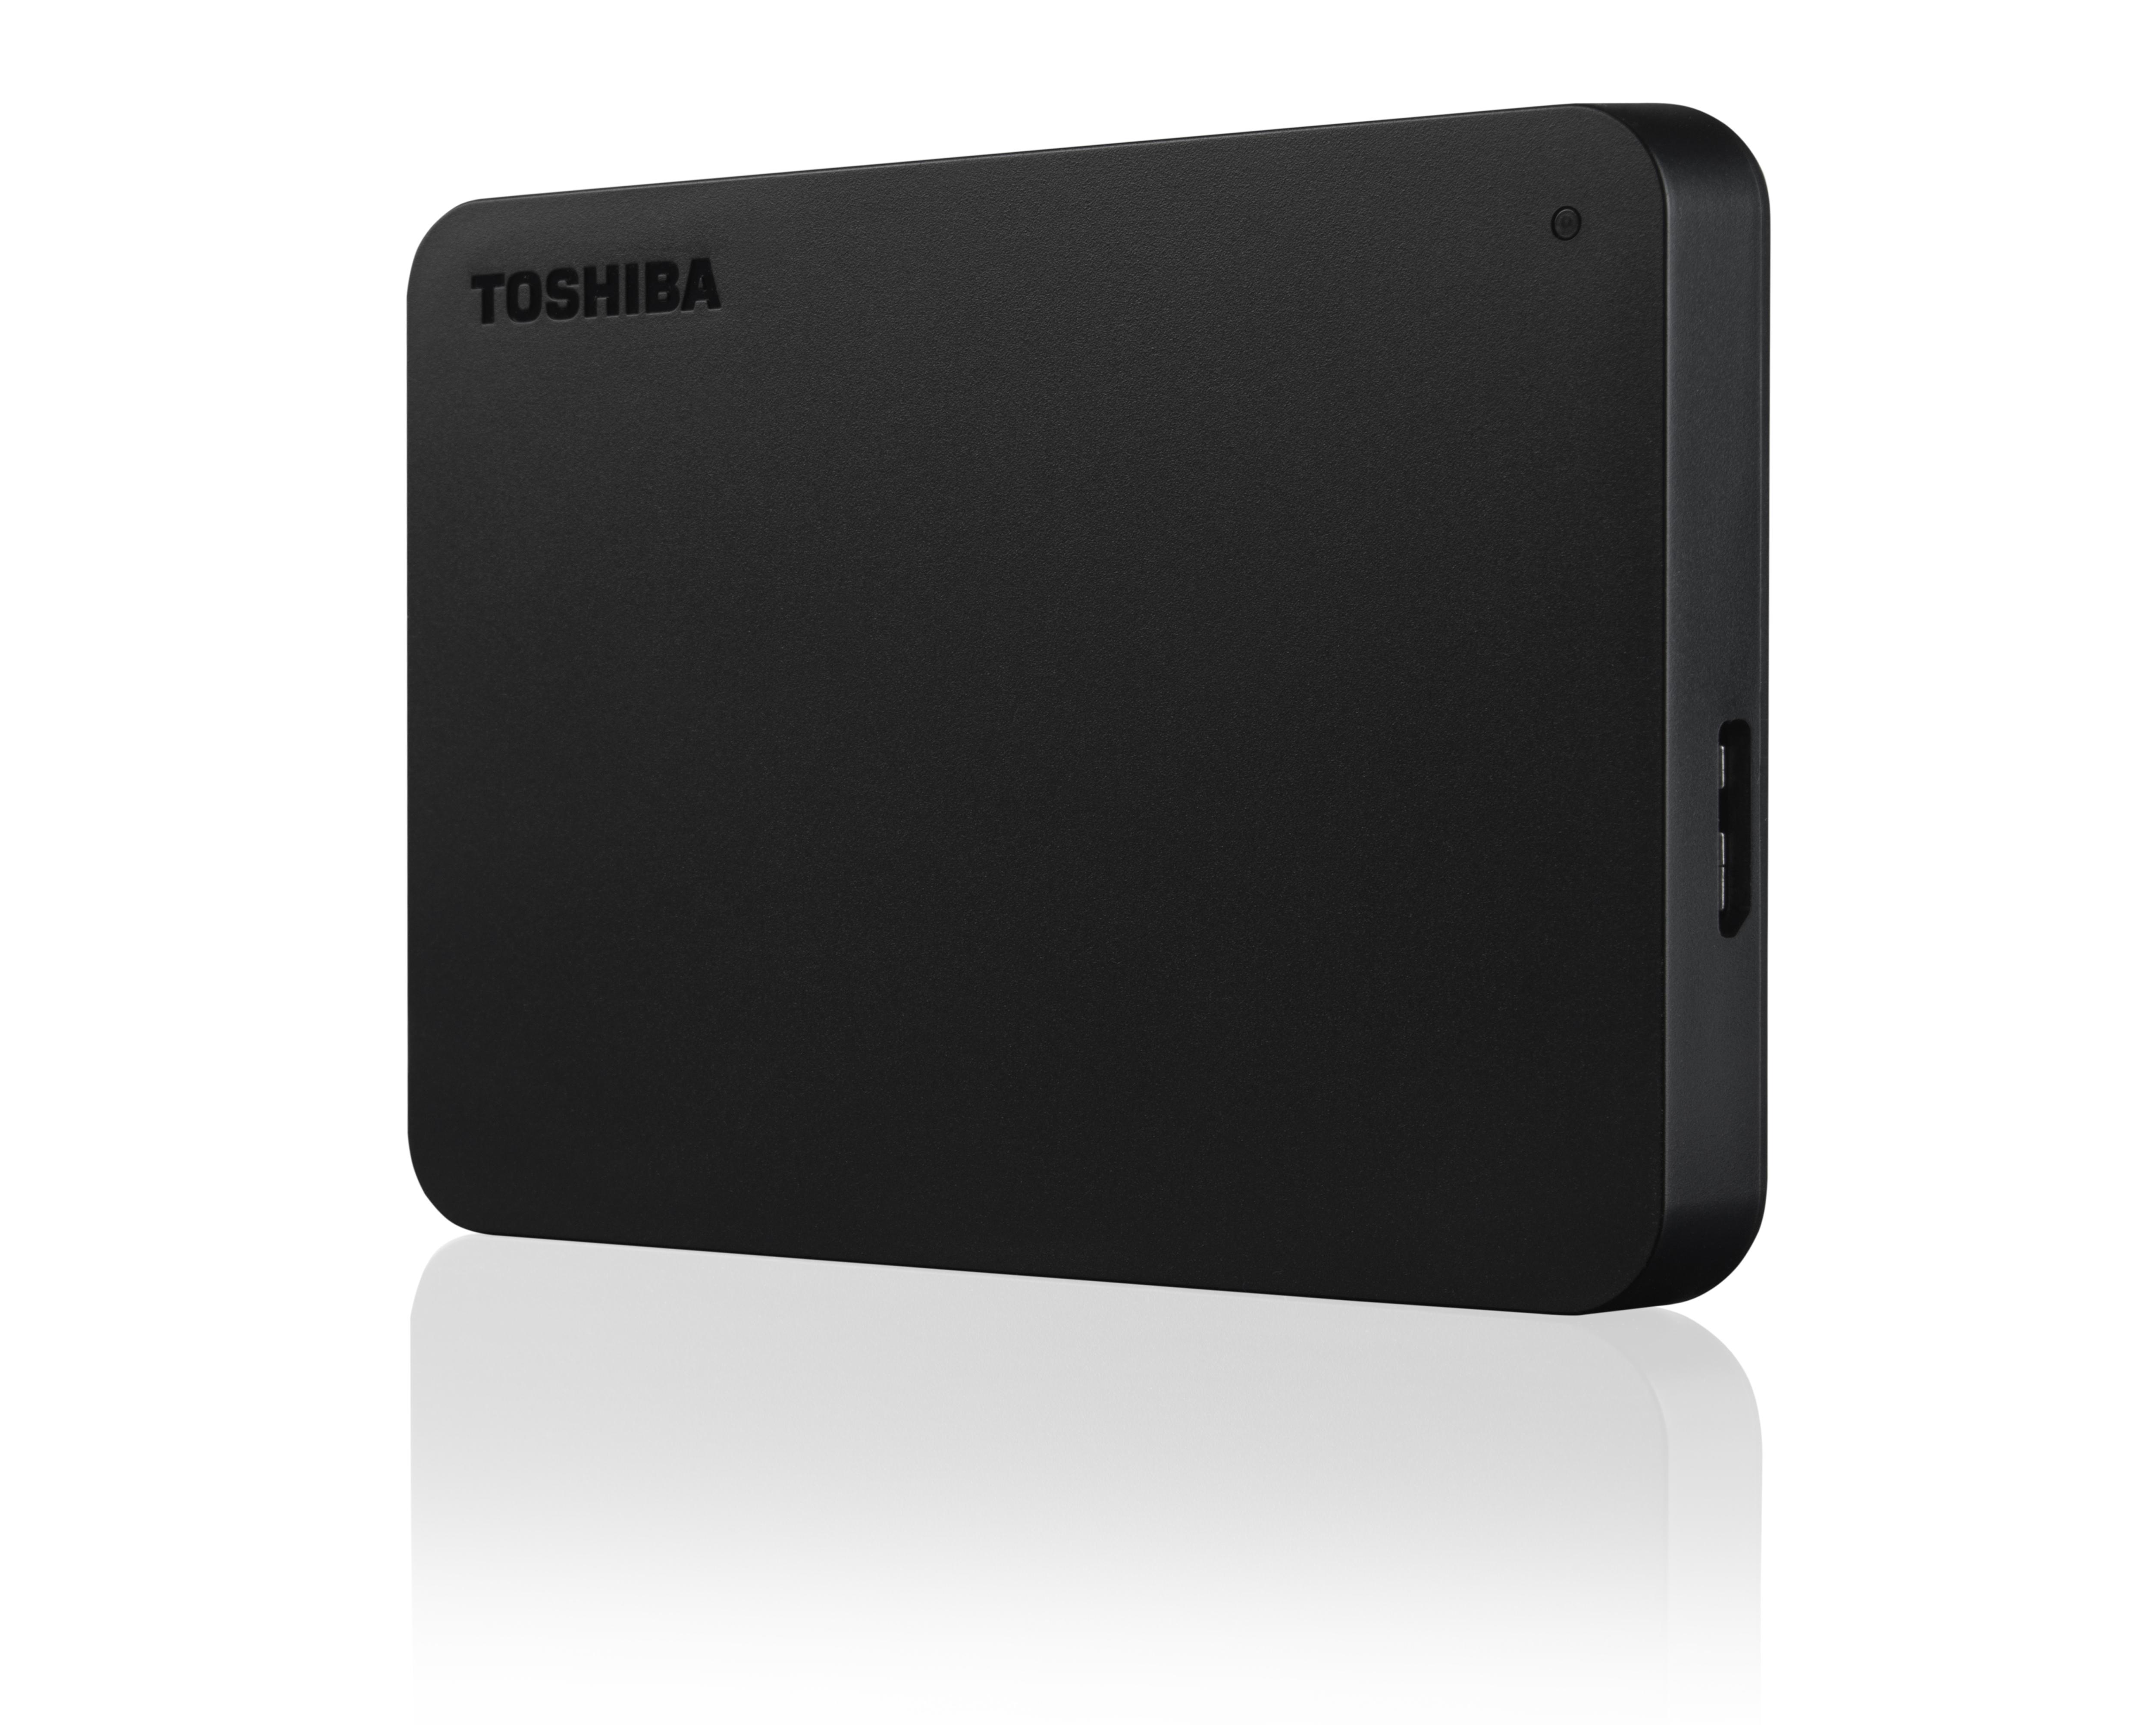 Toshiba Canvio Basics 1 TB Black - External HDD Drives - HDD Drives